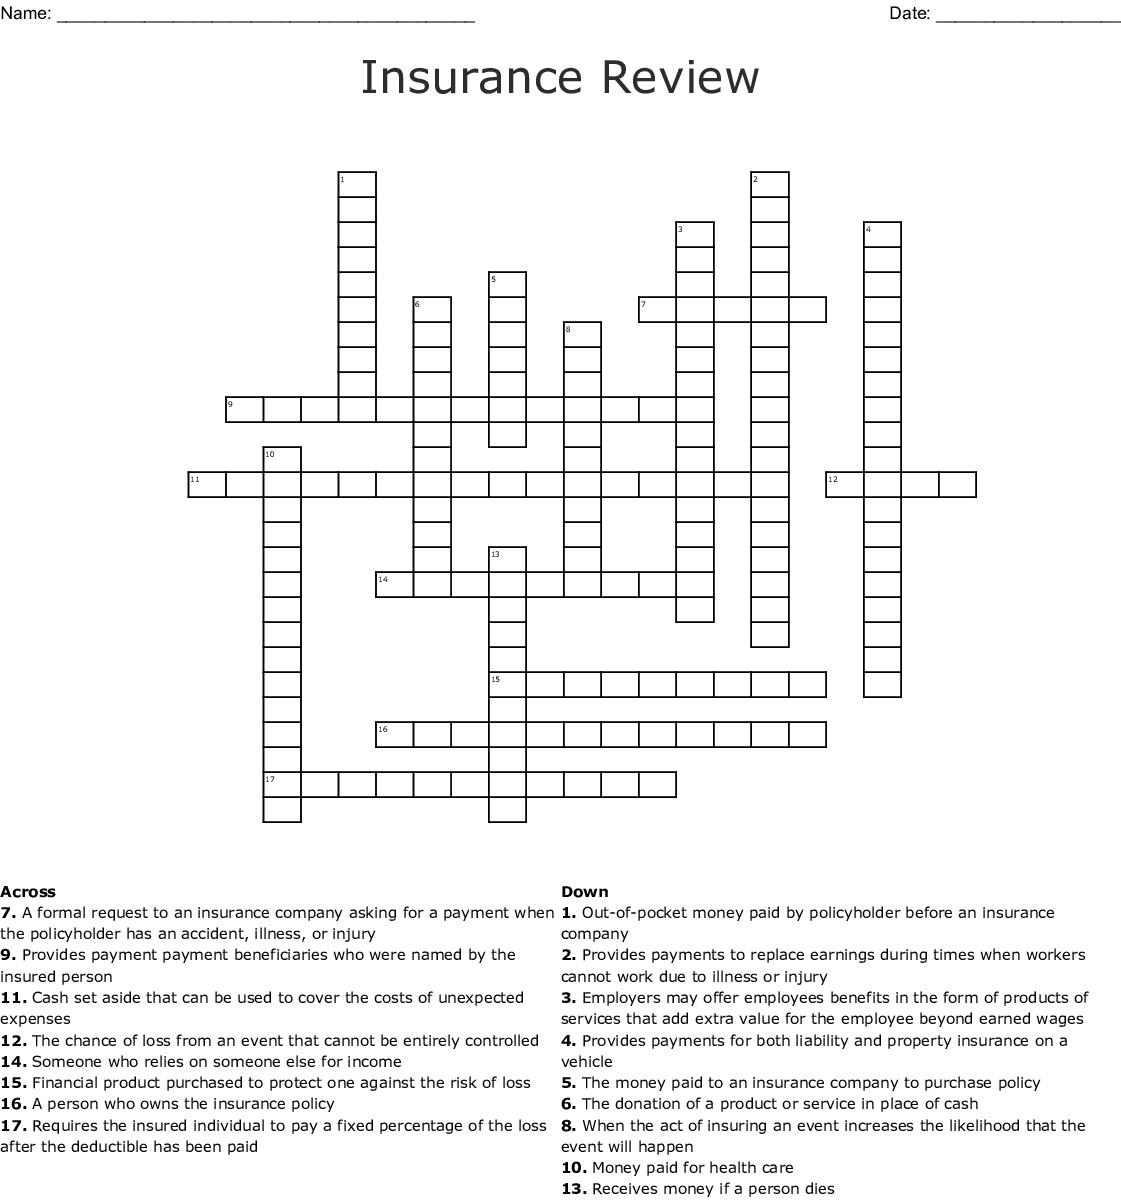 Insurance Review Crossword Wordmint